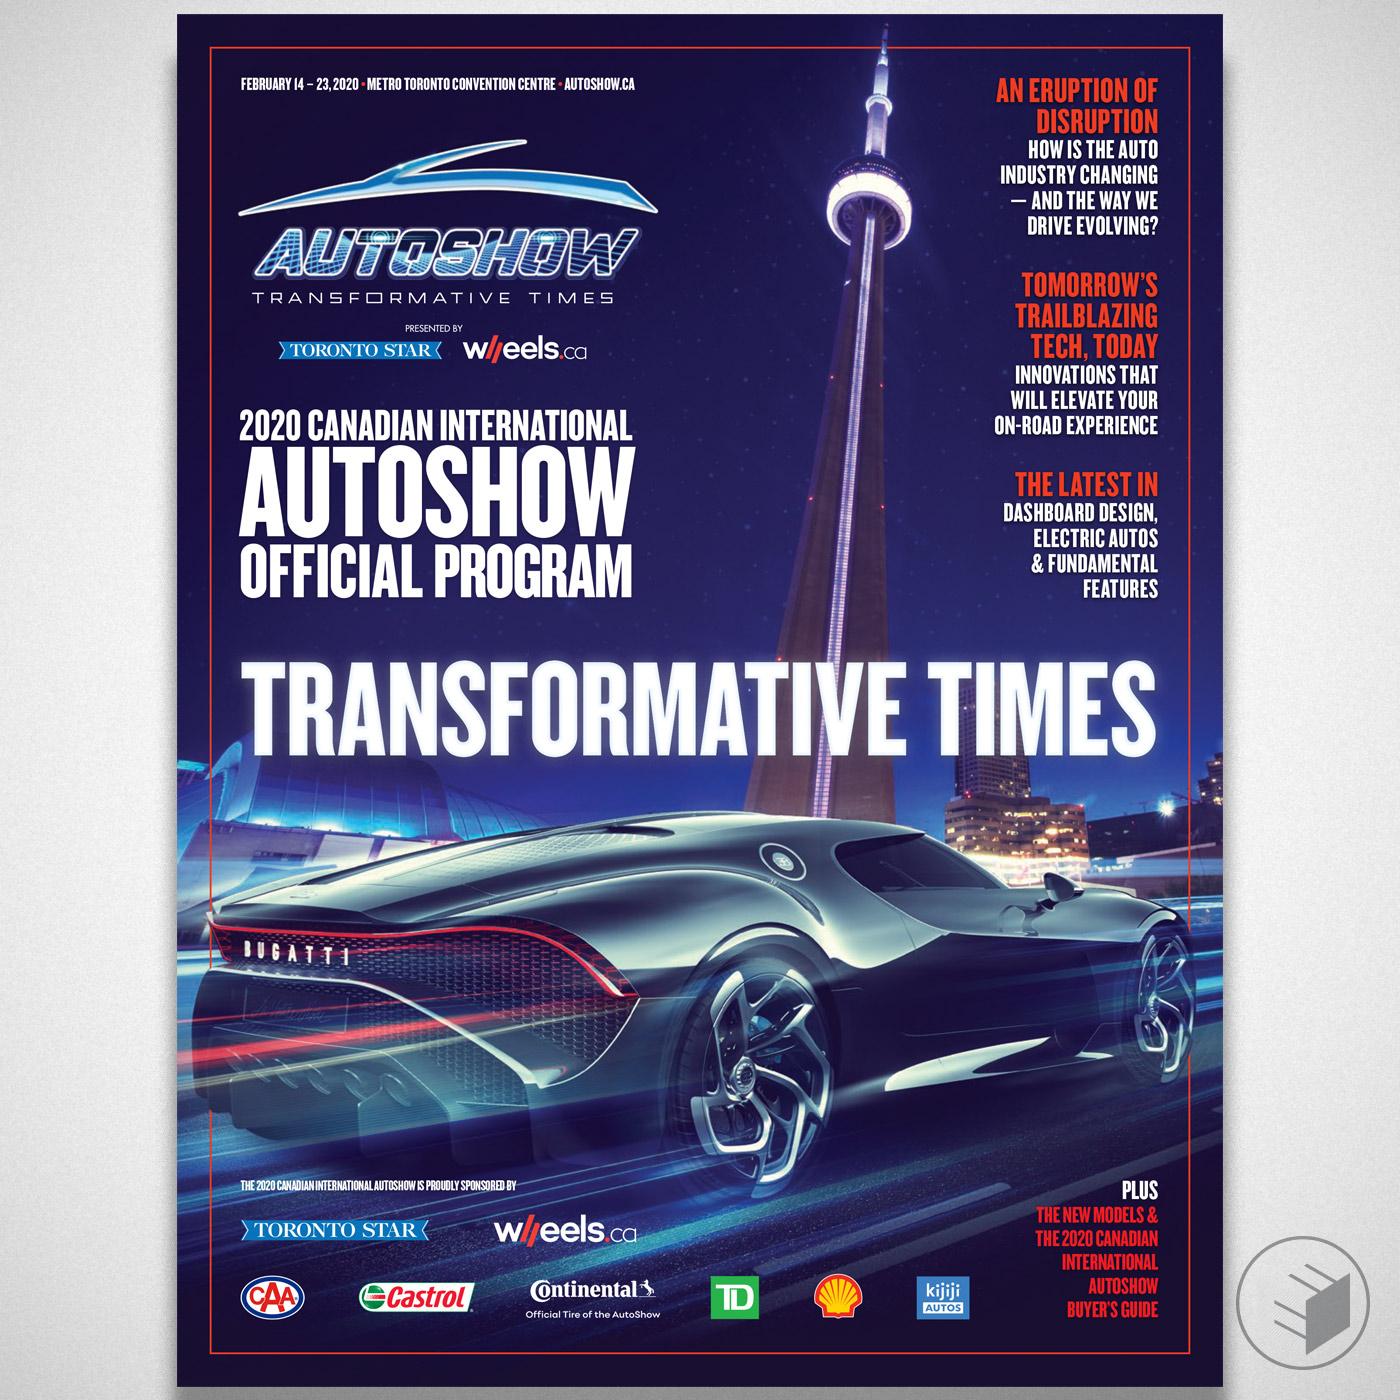 2020 CANADIAN INTERNATIONAL AUTOSHOW PROGRAM COVER